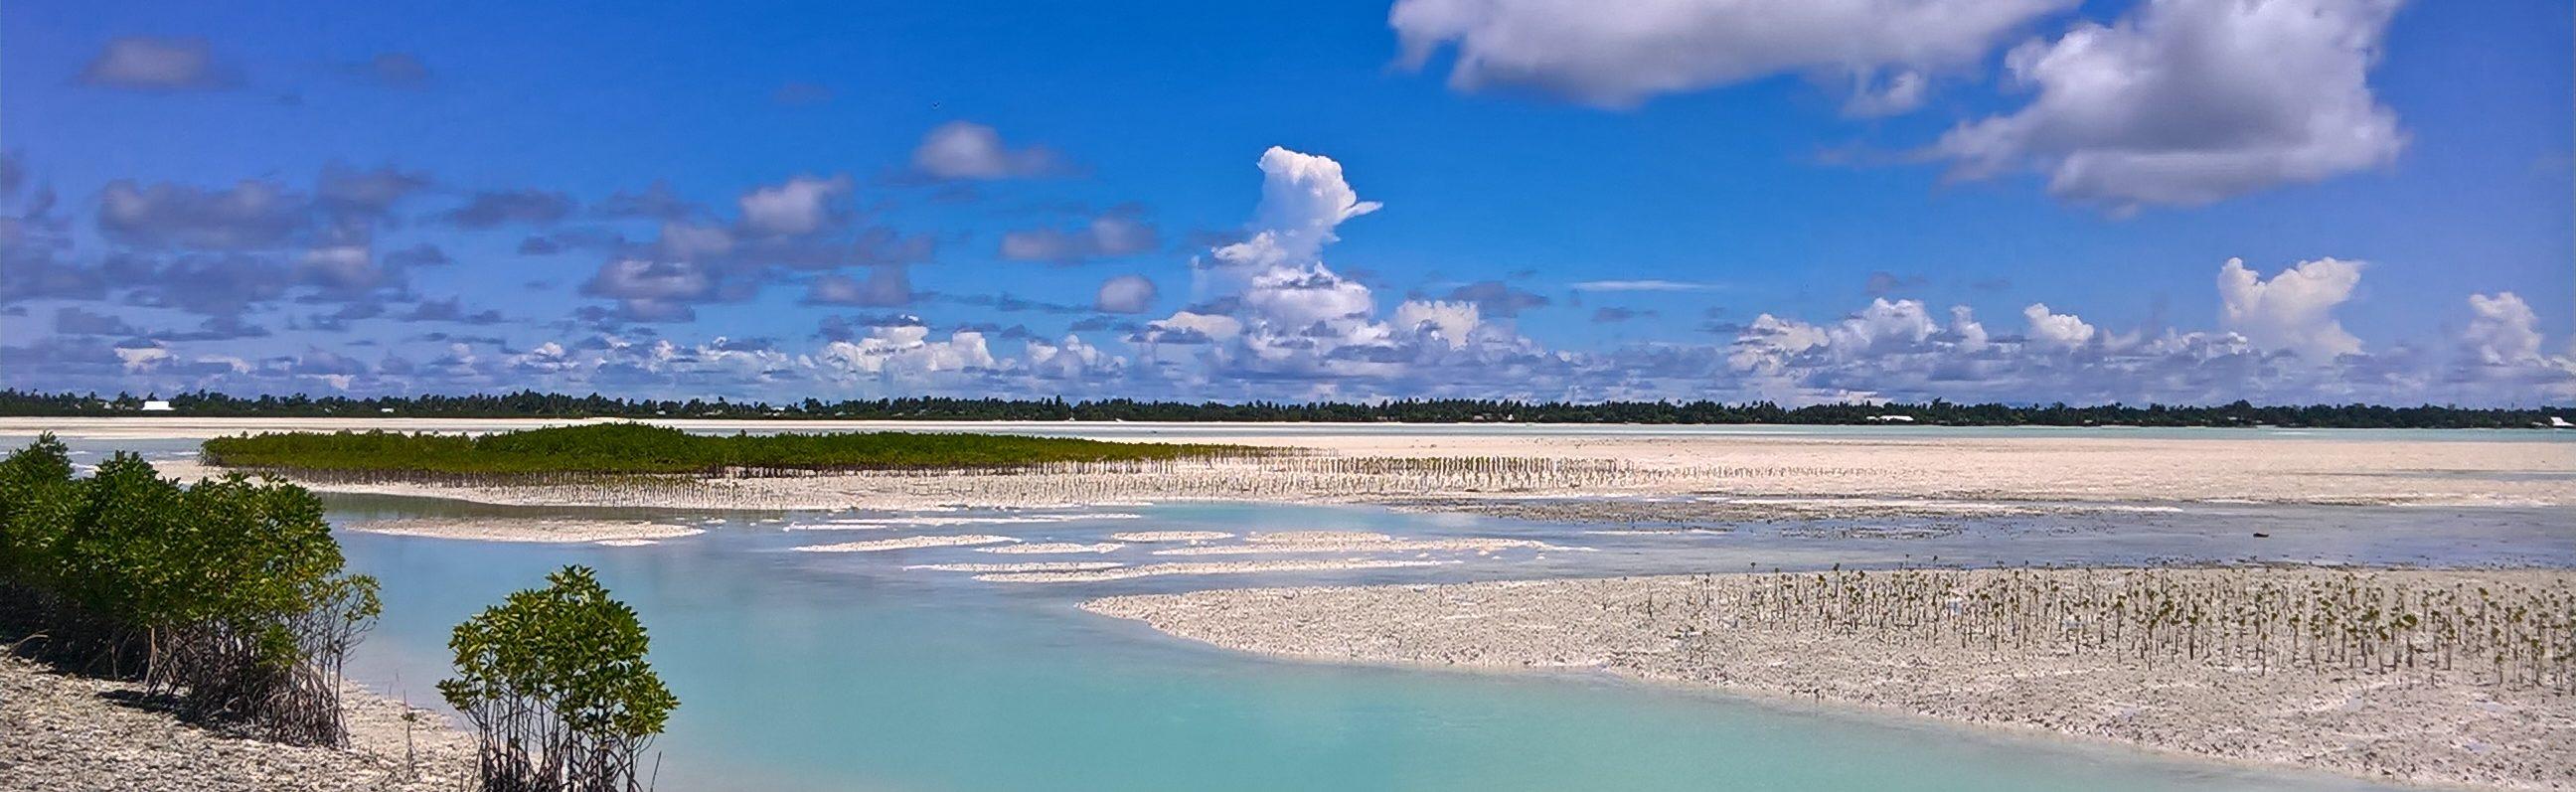 Kiribati landscape mangroves